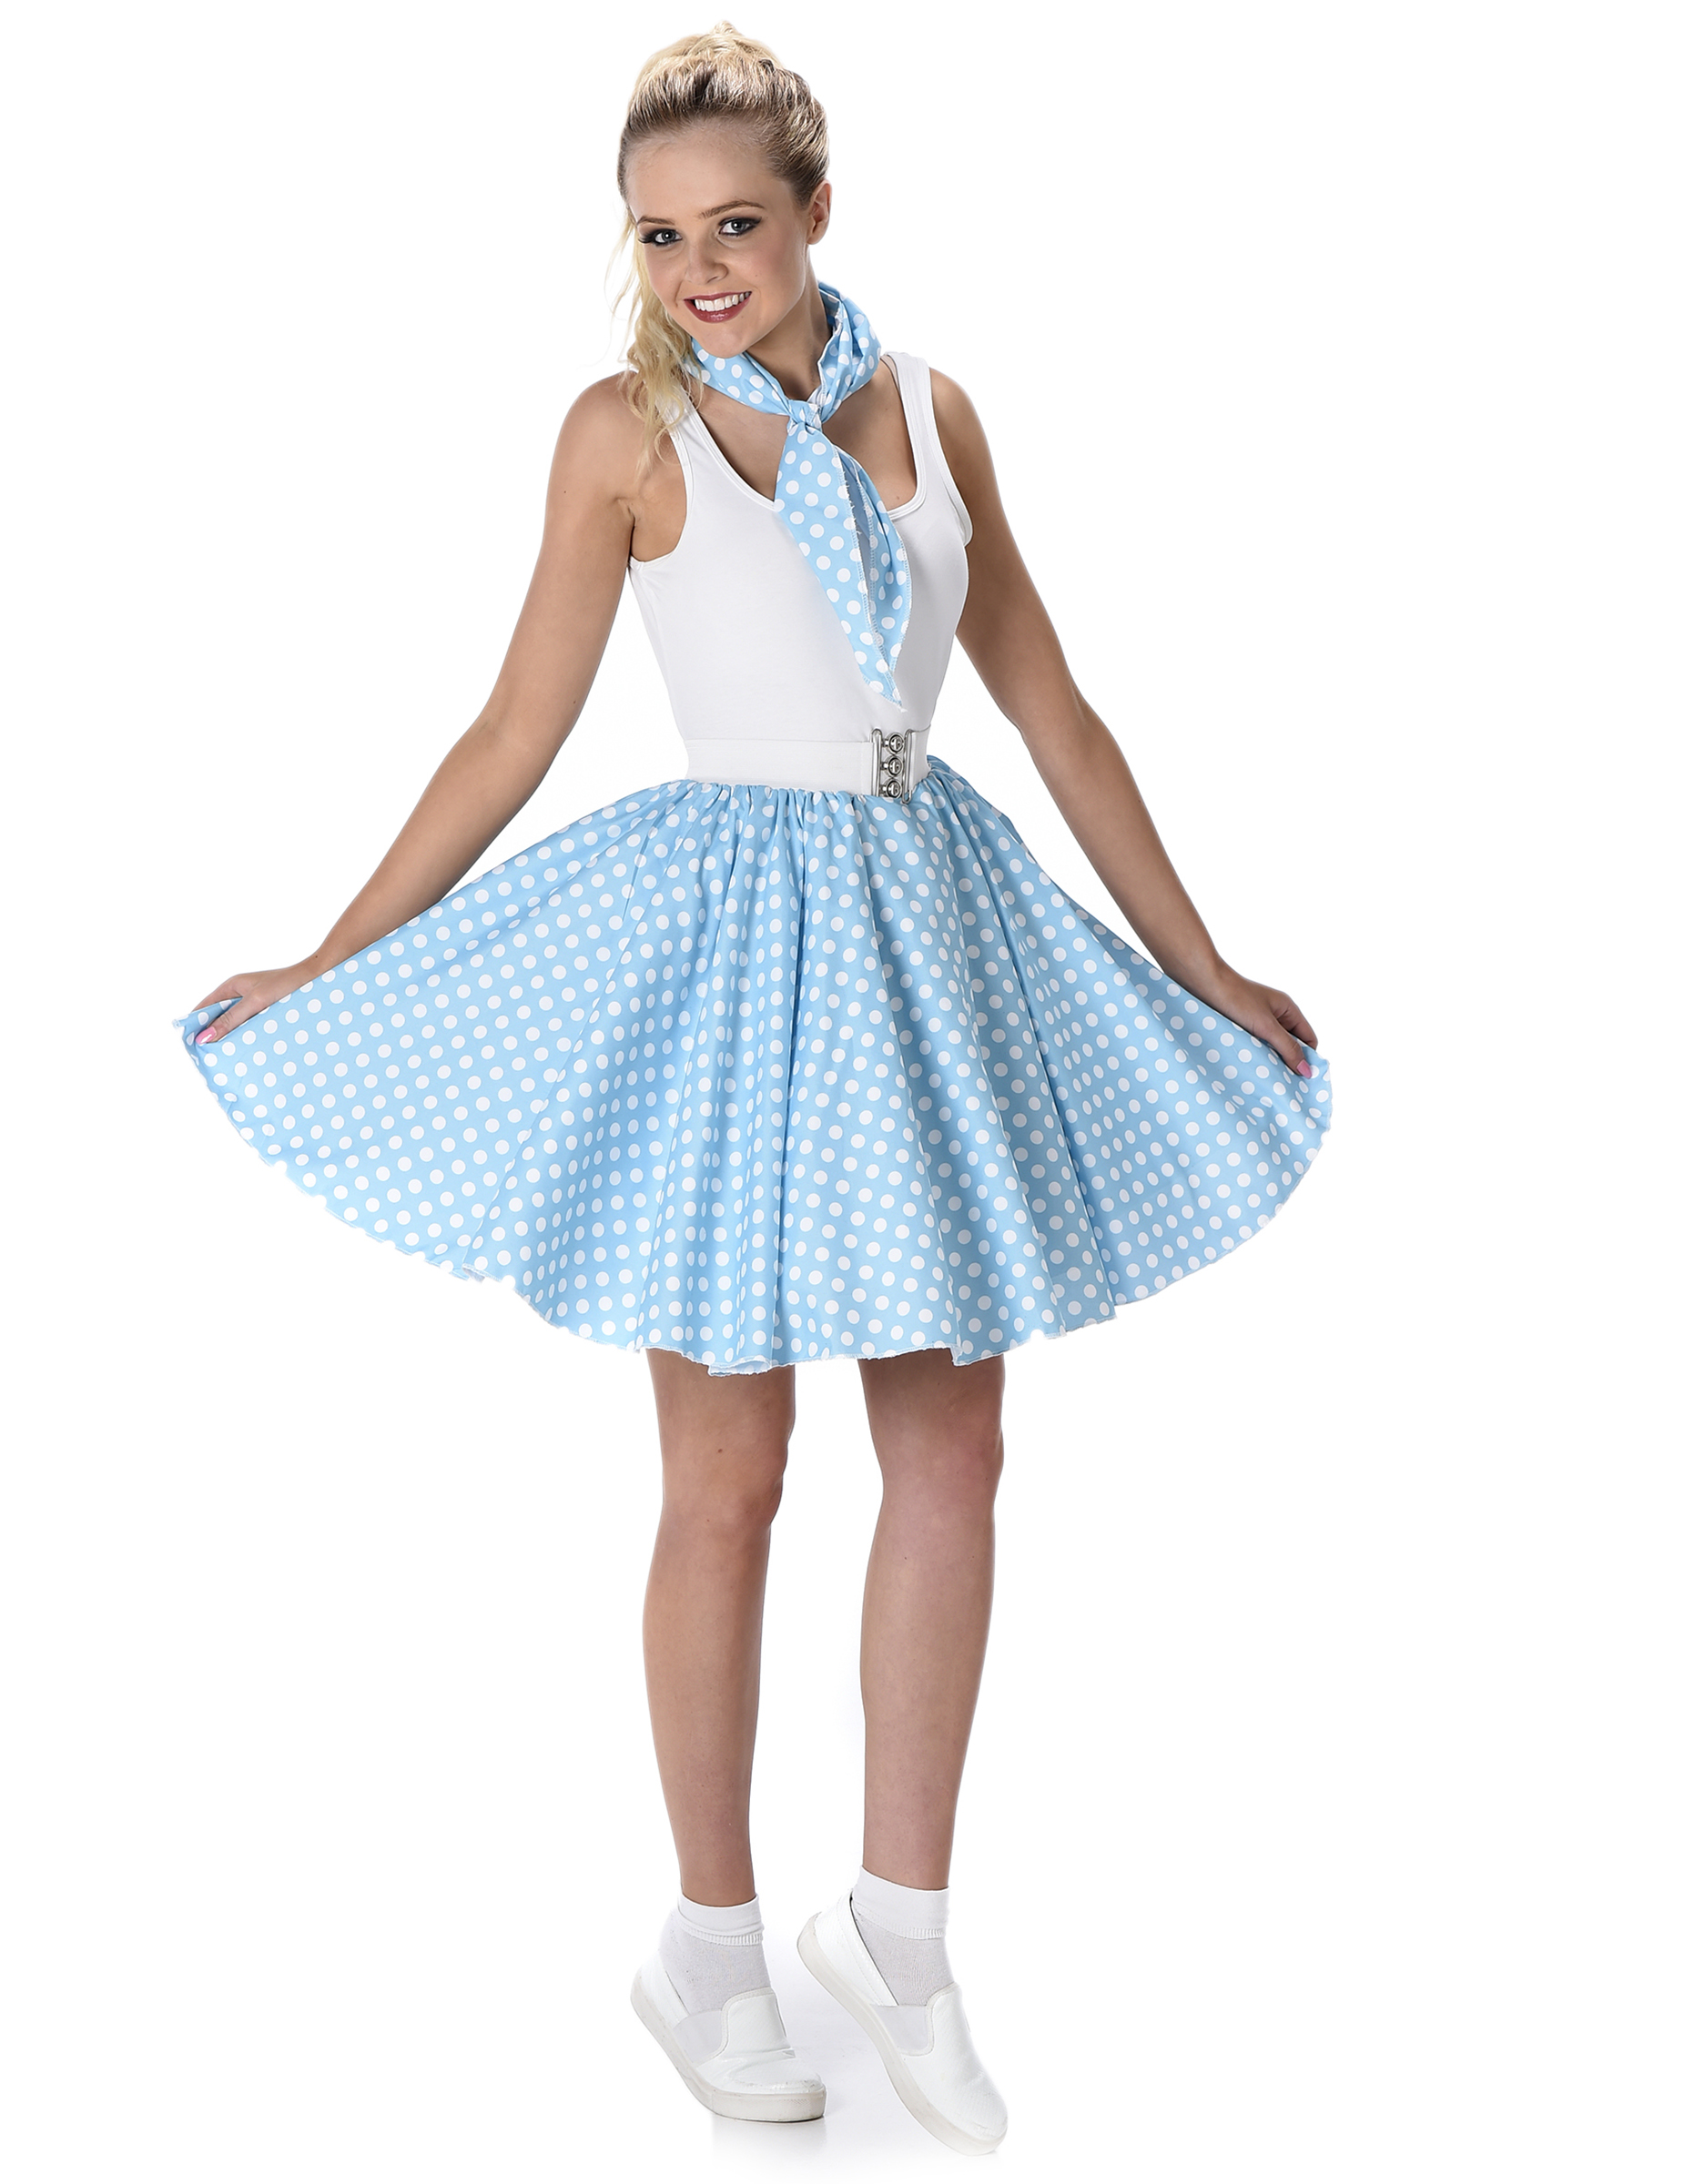 50er jahre outfit bei der modenschau model im teenager for Rockabilly outfit damen